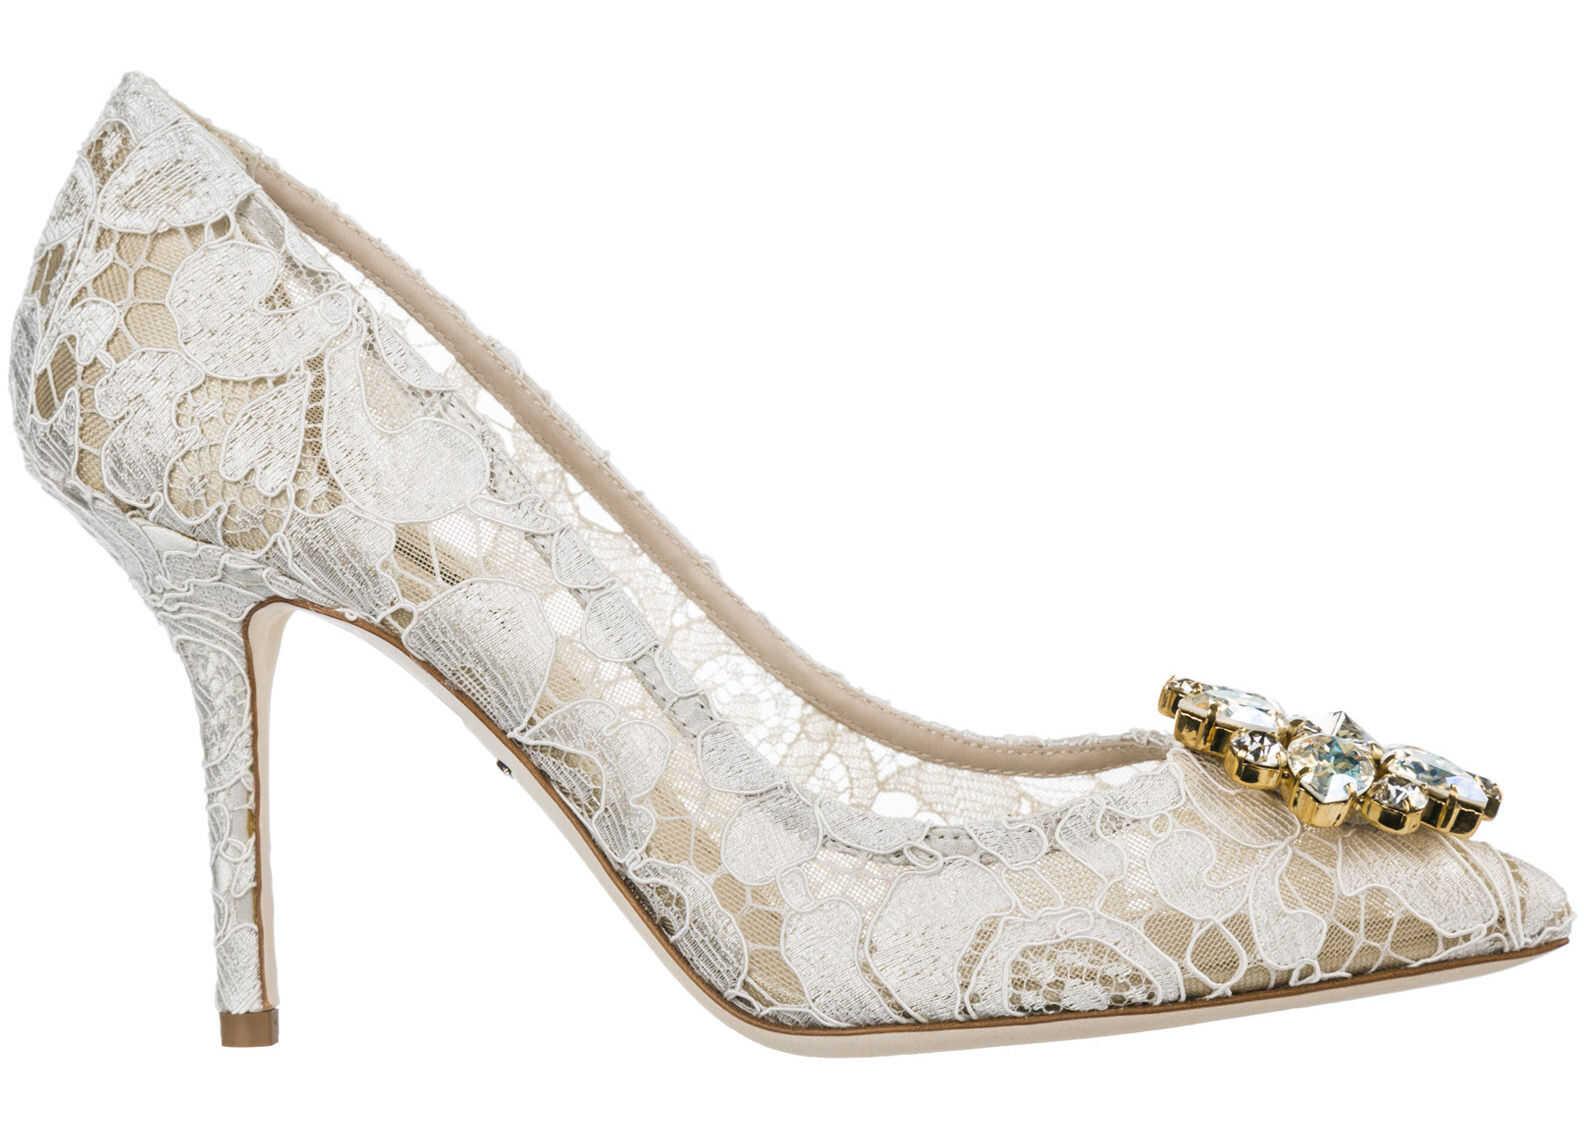 Dolce & Gabbana Shoes Bellucci White